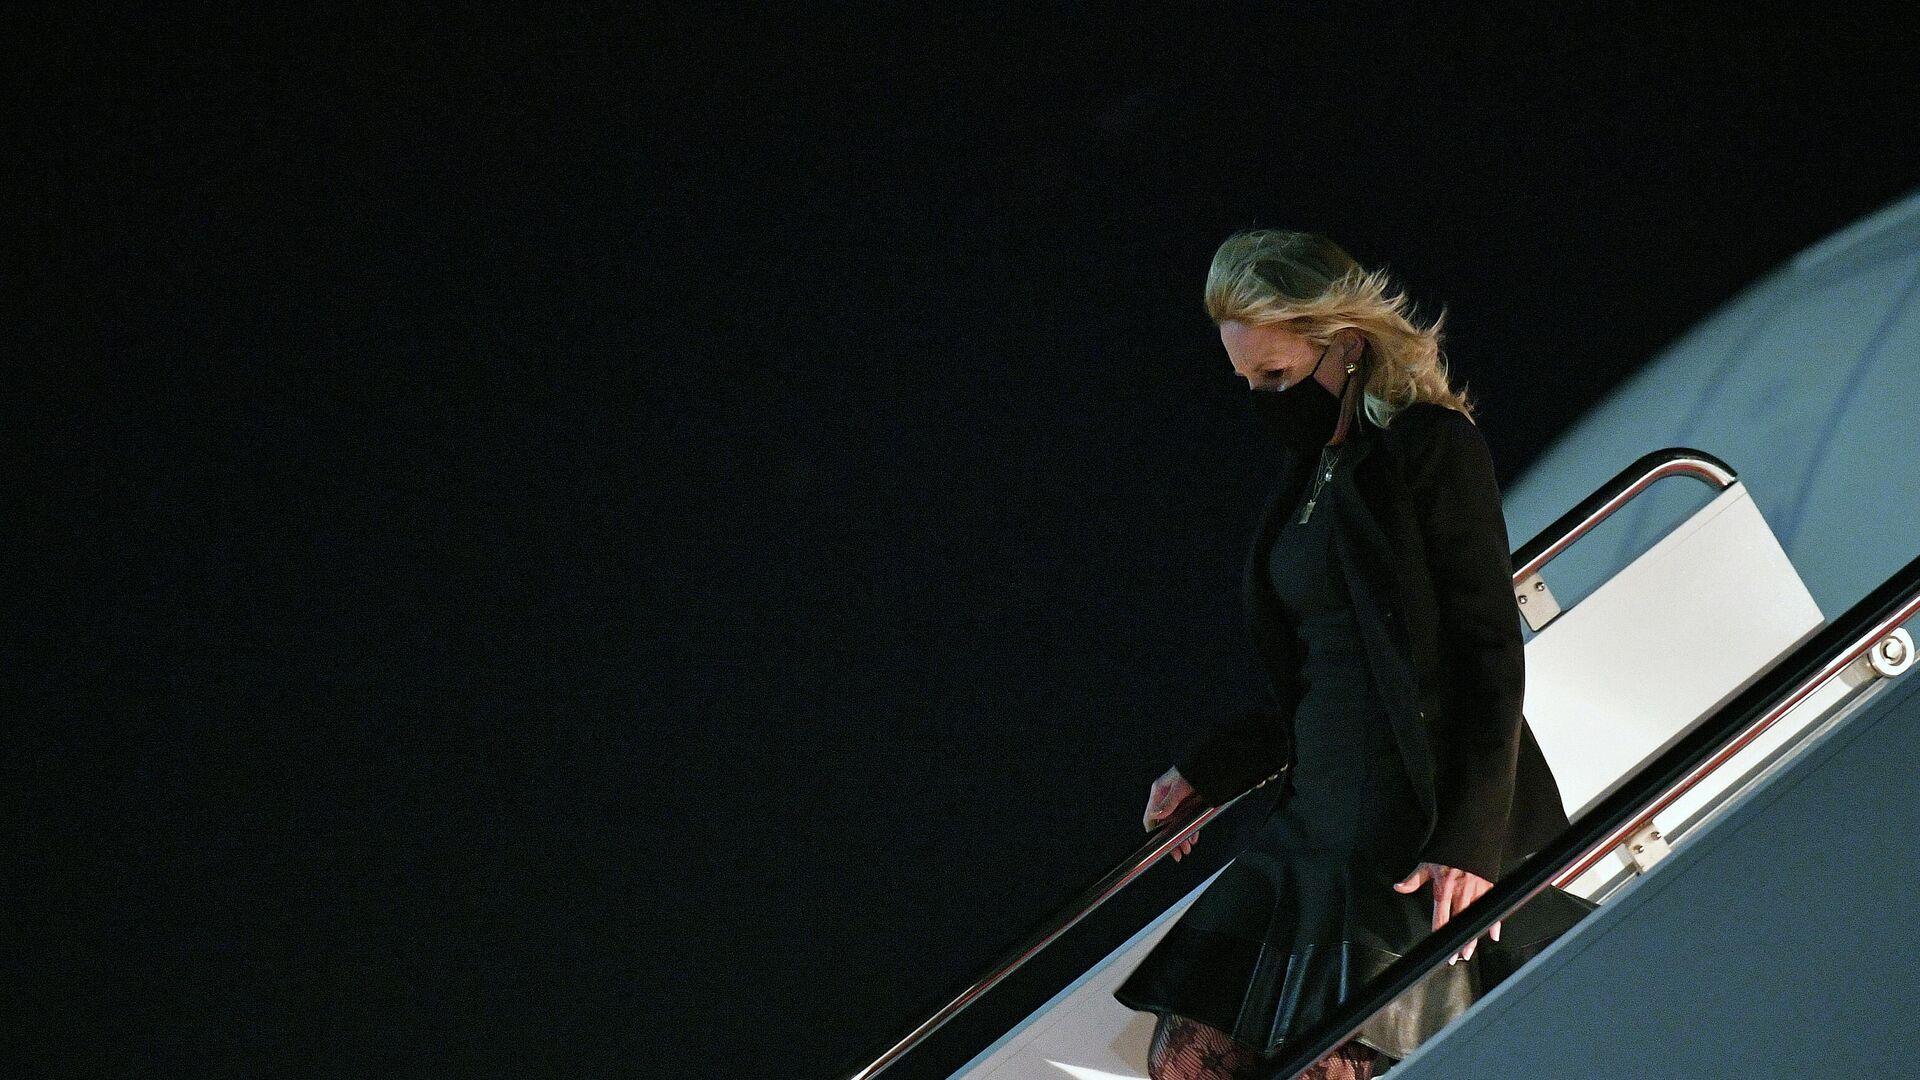 La primera dama, Jill Biden, aterriza tras regresar de una visita a California - Sputnik Mundo, 1920, 02.04.2021